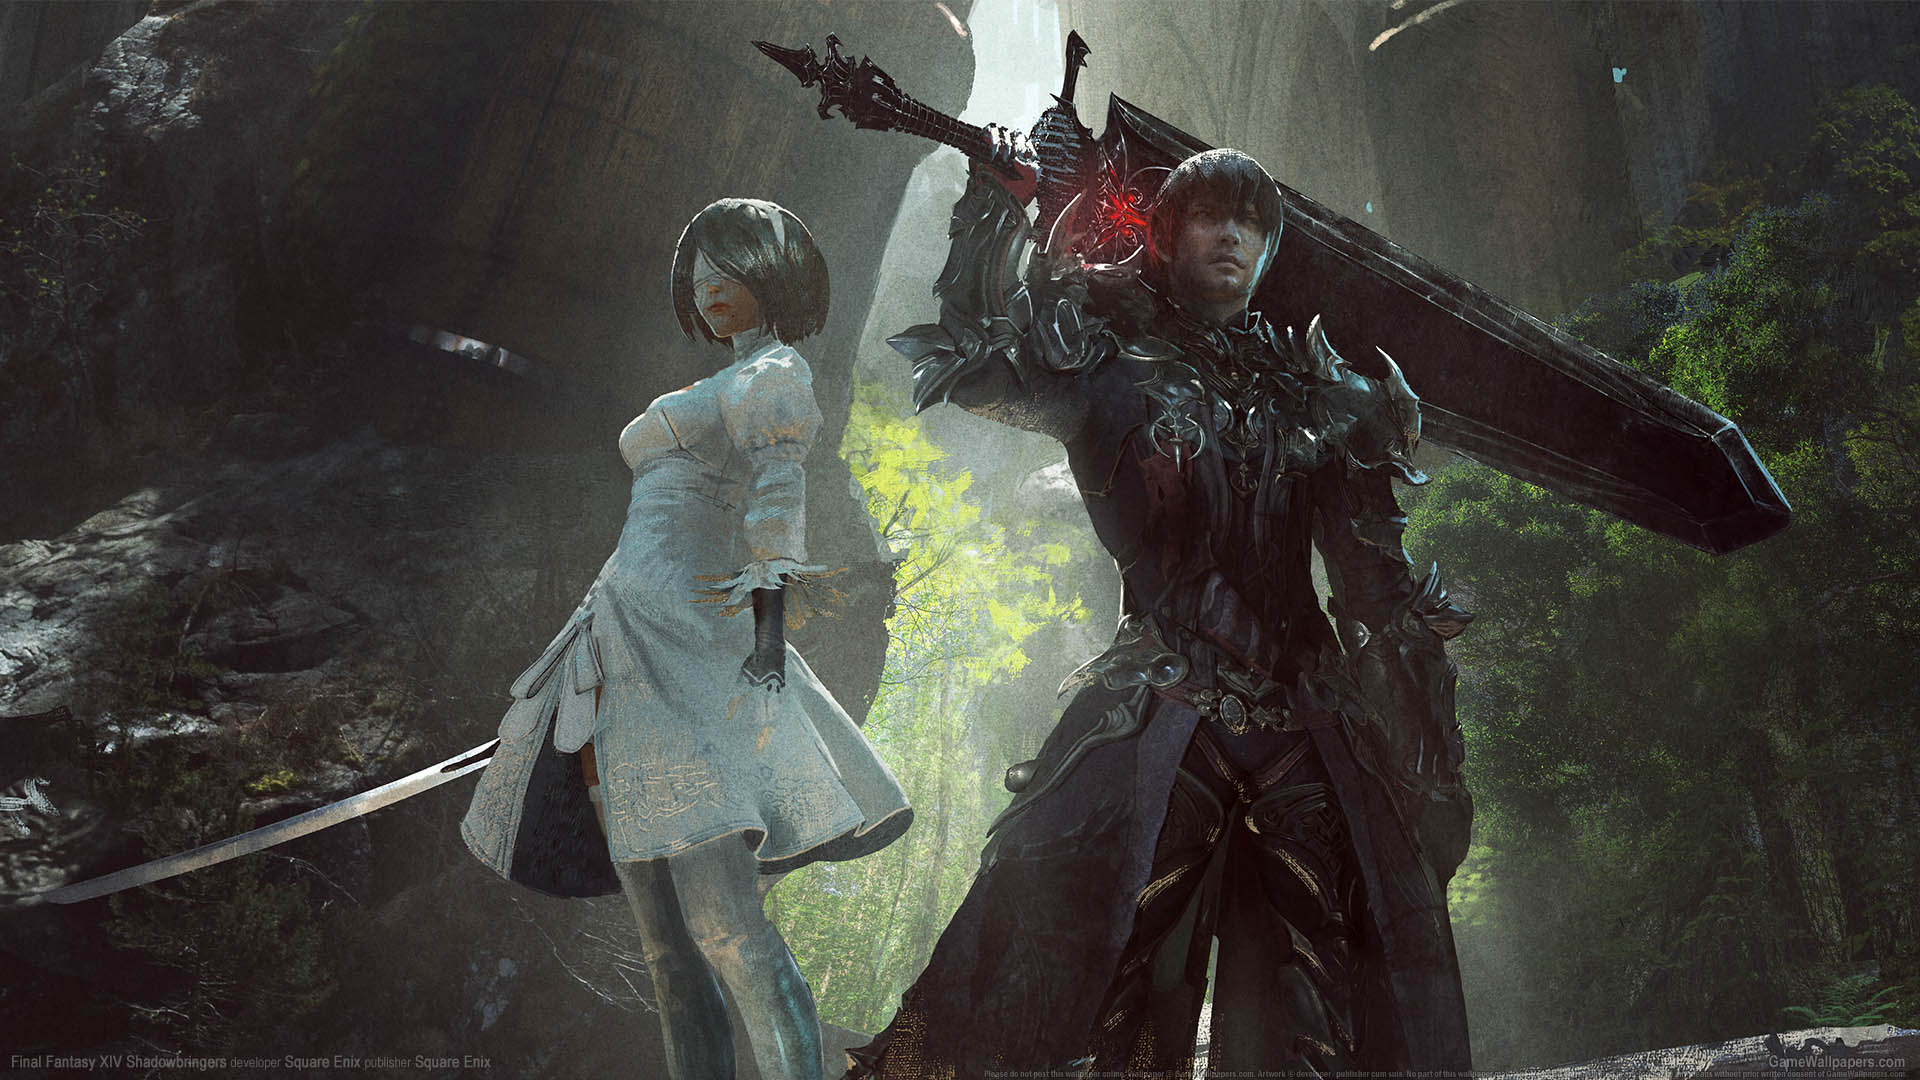 Final Fantasy XIV: Shadowbringers wallpaper 01 1920x1080